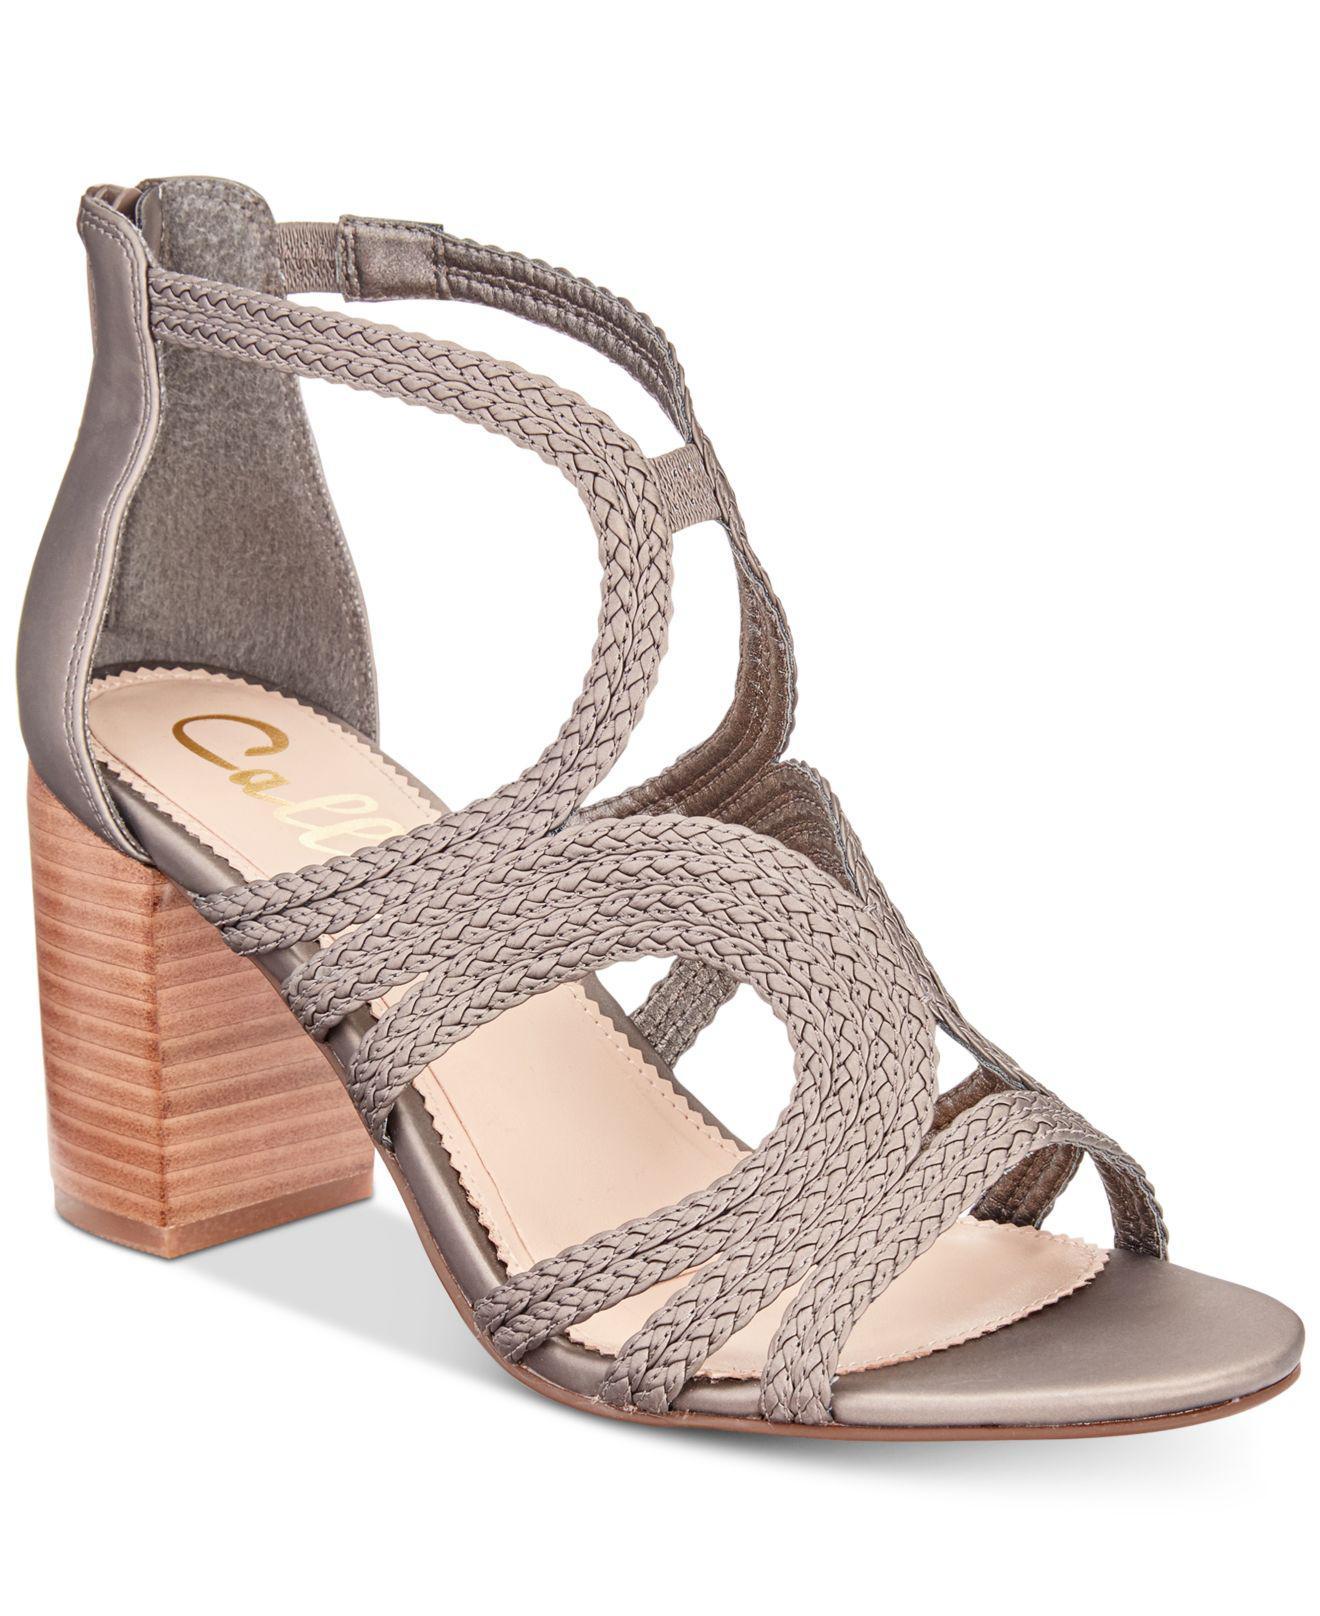 Callisto Shindig Strappy Block-Heel Sandals Women's Shoes Mv665GEASJ